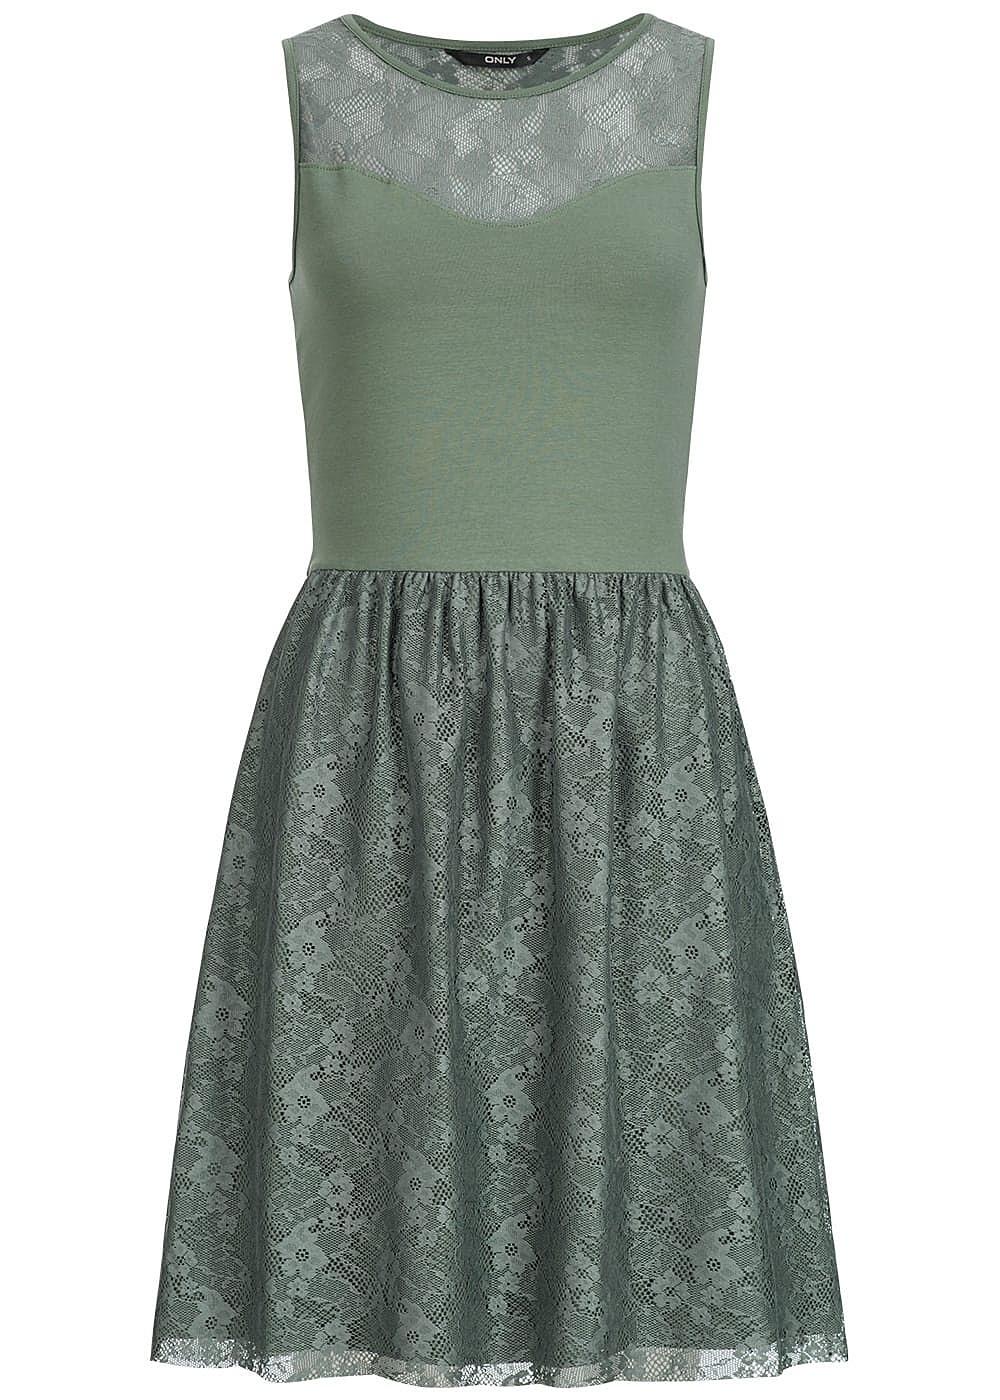 15 Luxurius Kleid Türkis Spitze Boutique20 Genial Kleid Türkis Spitze Spezialgebiet